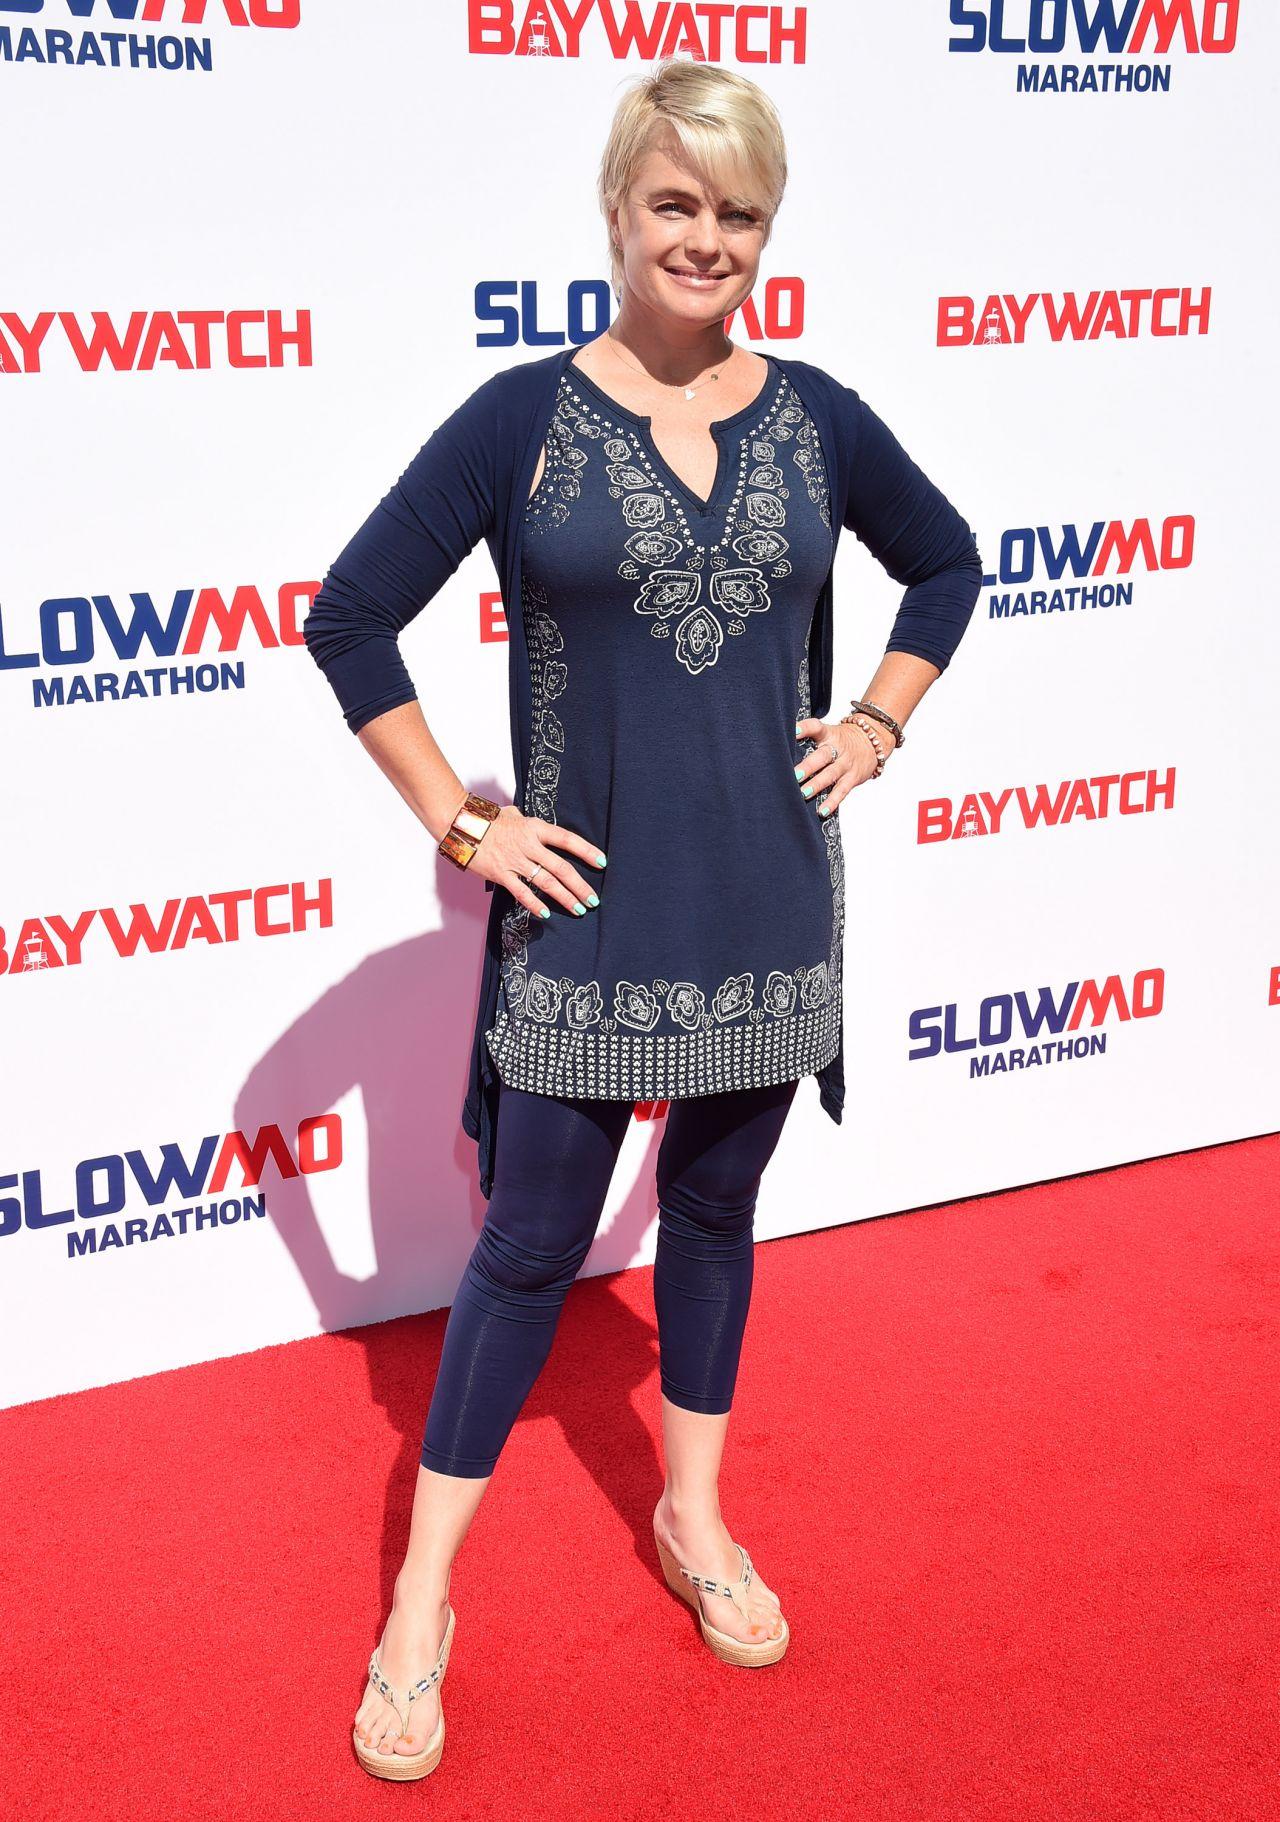 Erika Eleniak - Baywatch Casts Hosts the Slomo Marathon in ...